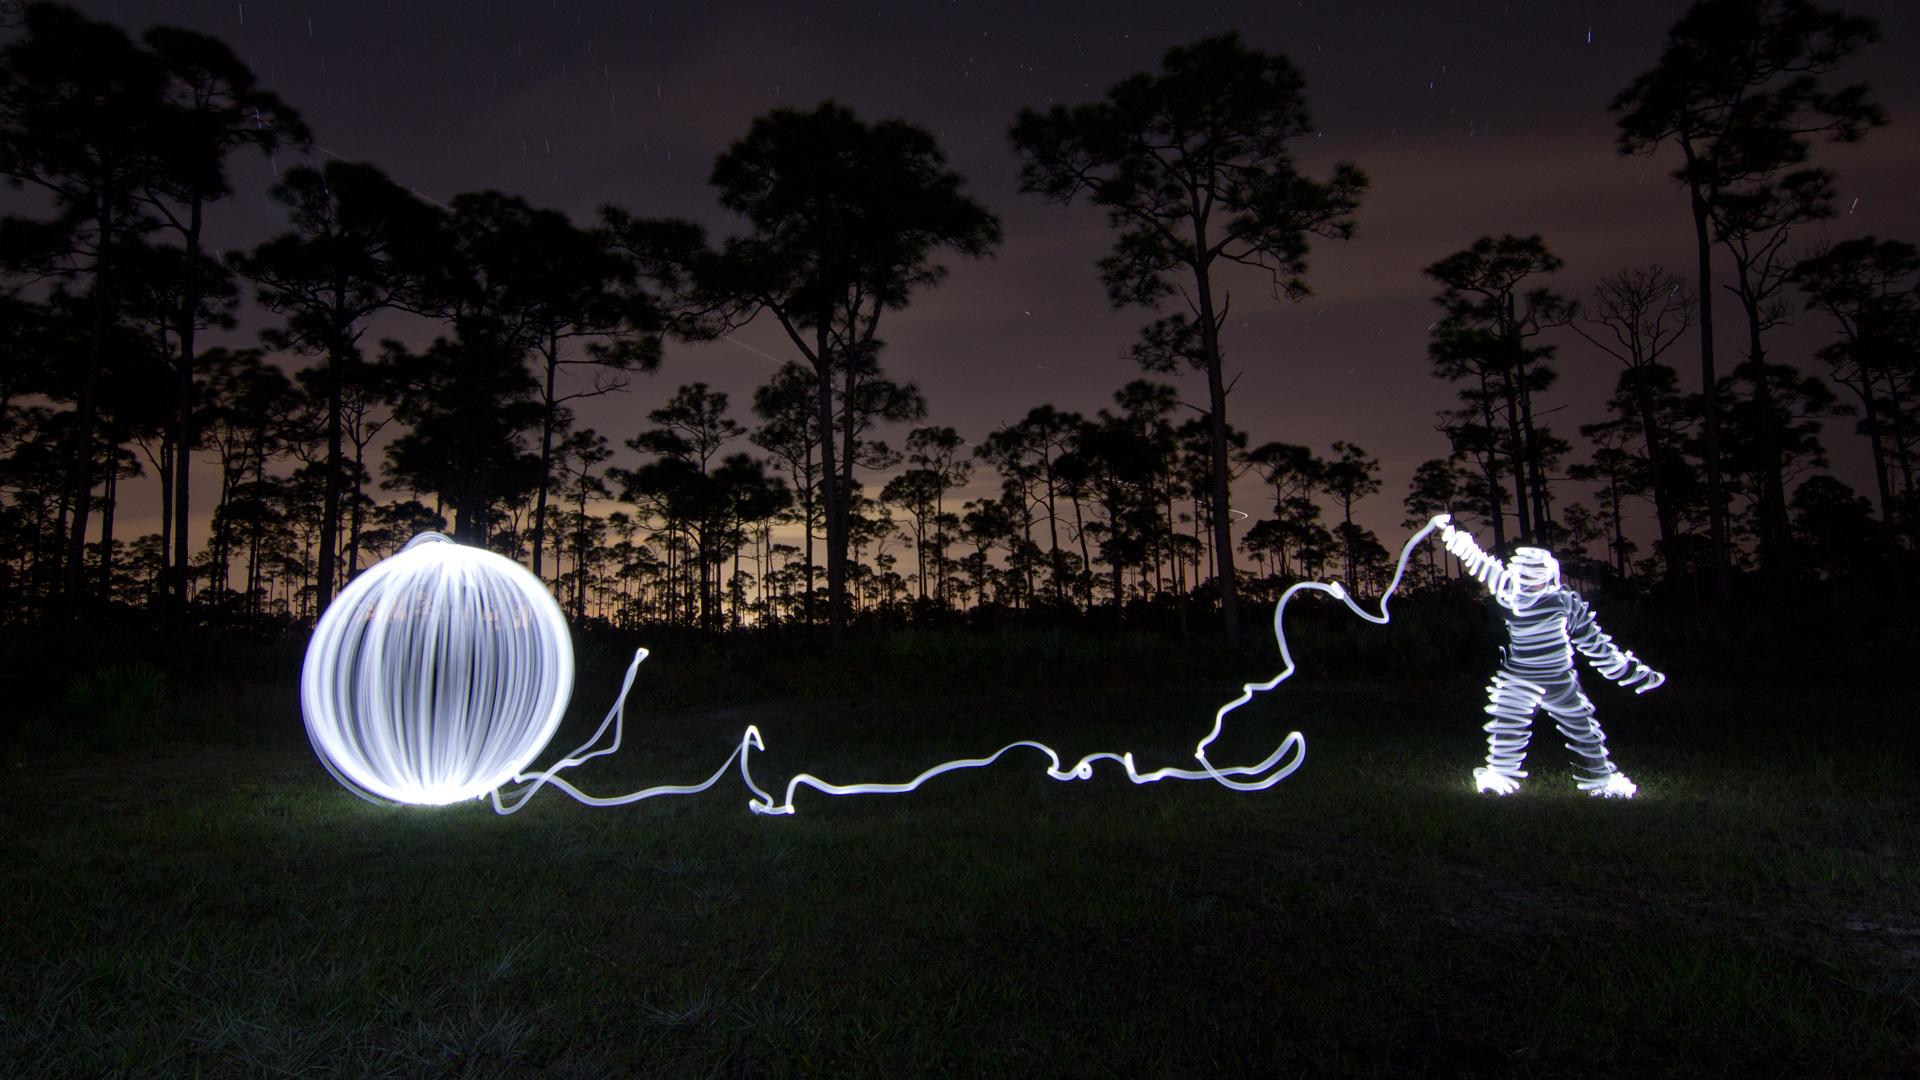 light-man-with-orb